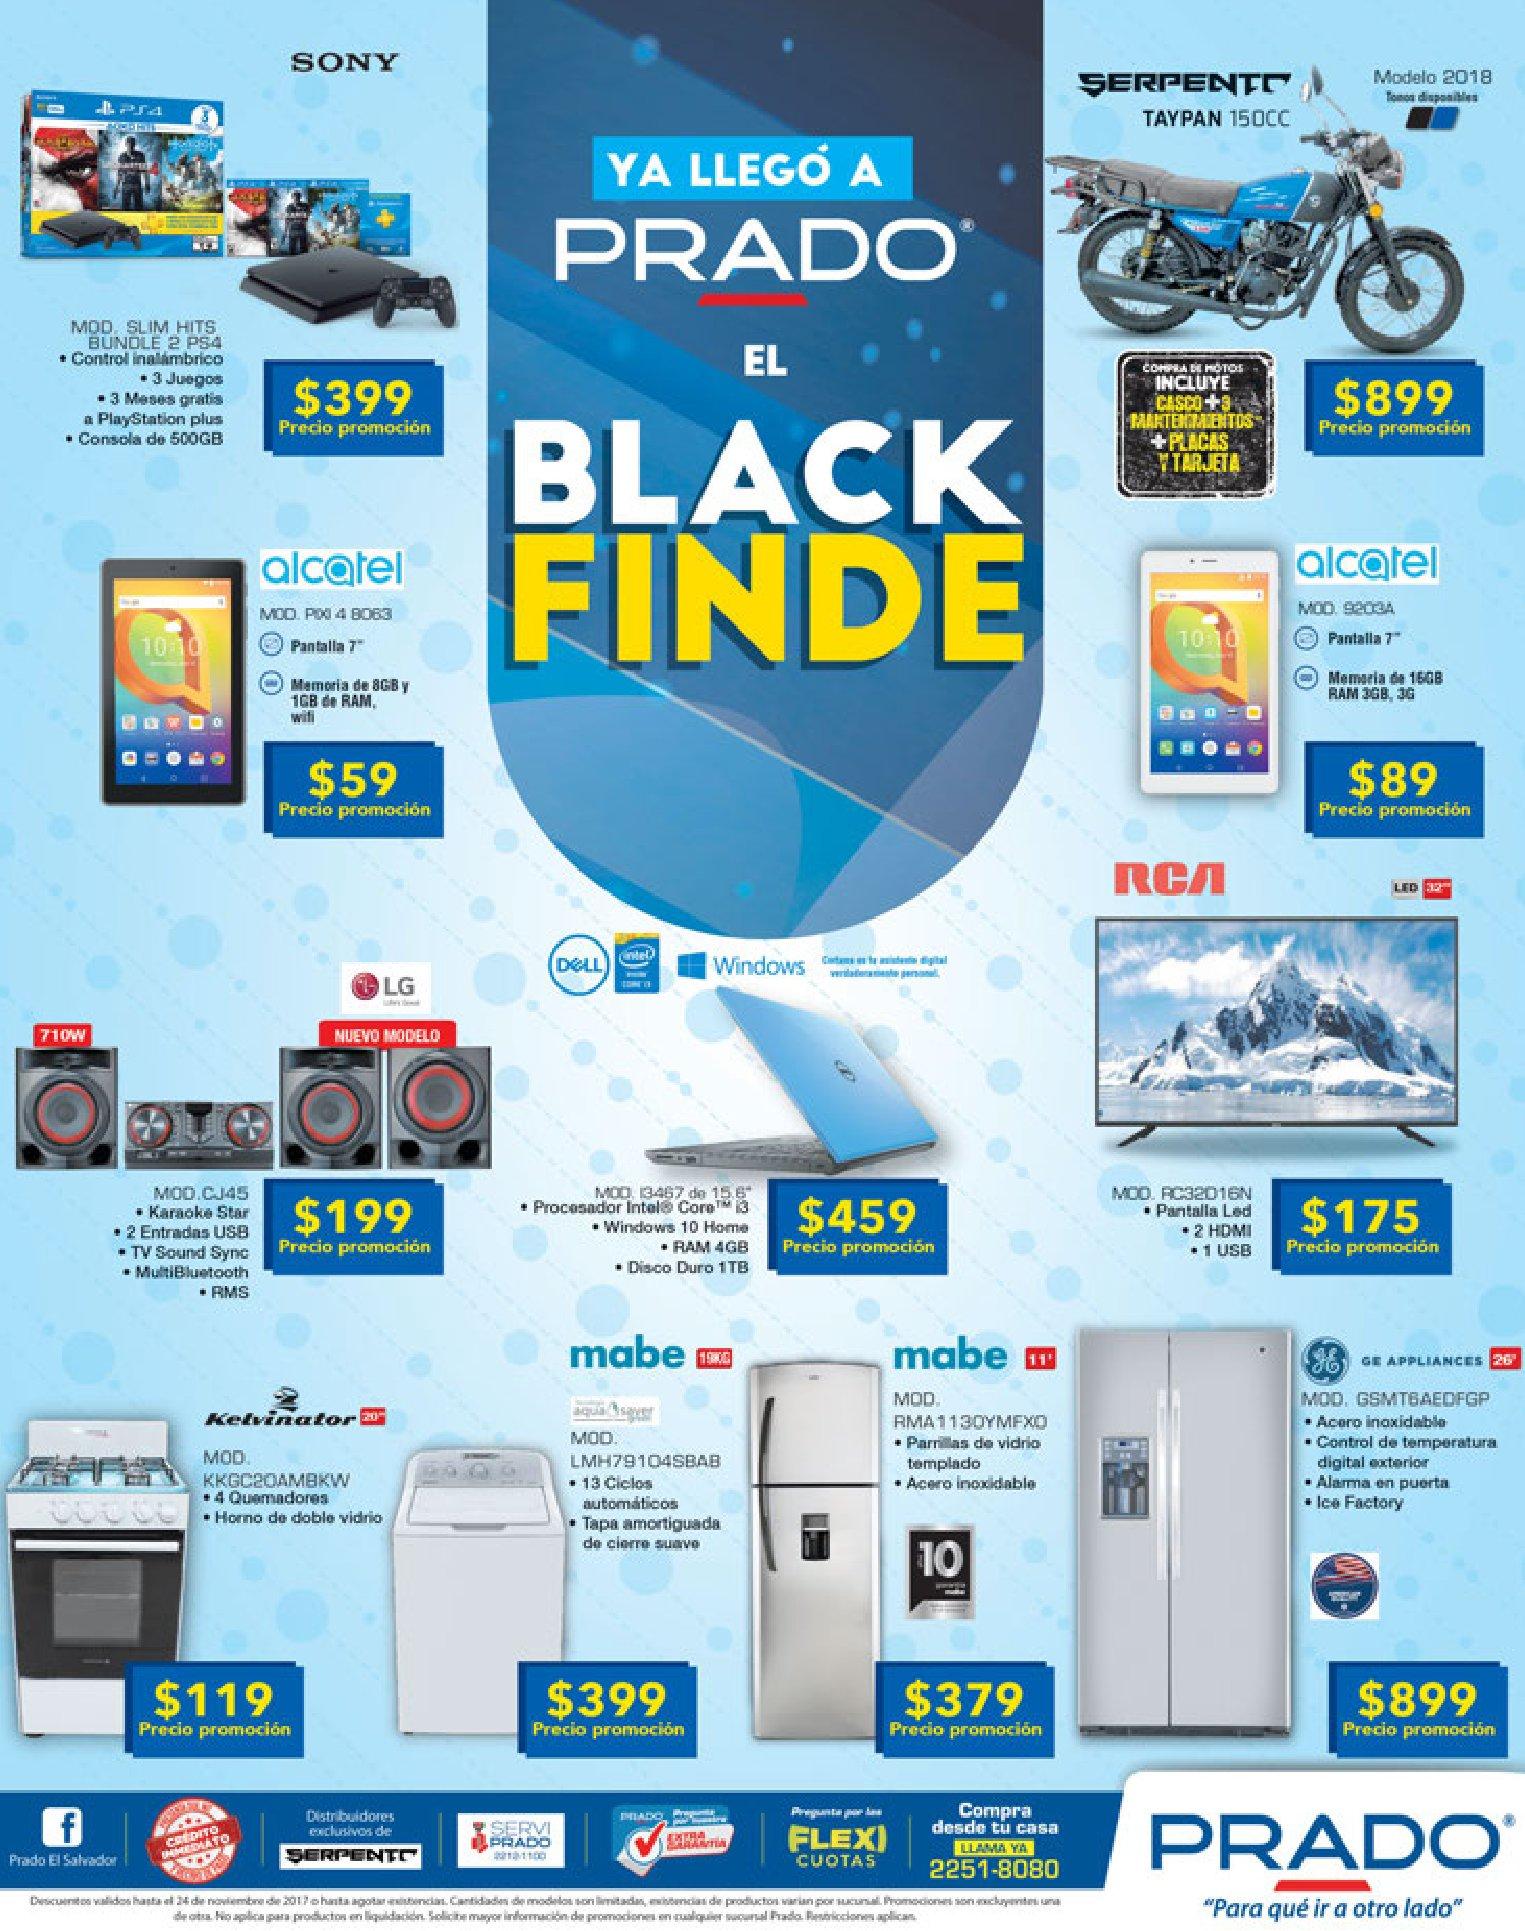 el prado black singles Property valuation of el prado boulevard, tampa, fl: 3120, 3136, 3411, 3501, 3515, 3613, 3702, 3711, 3712, 3713 (tax assessments.